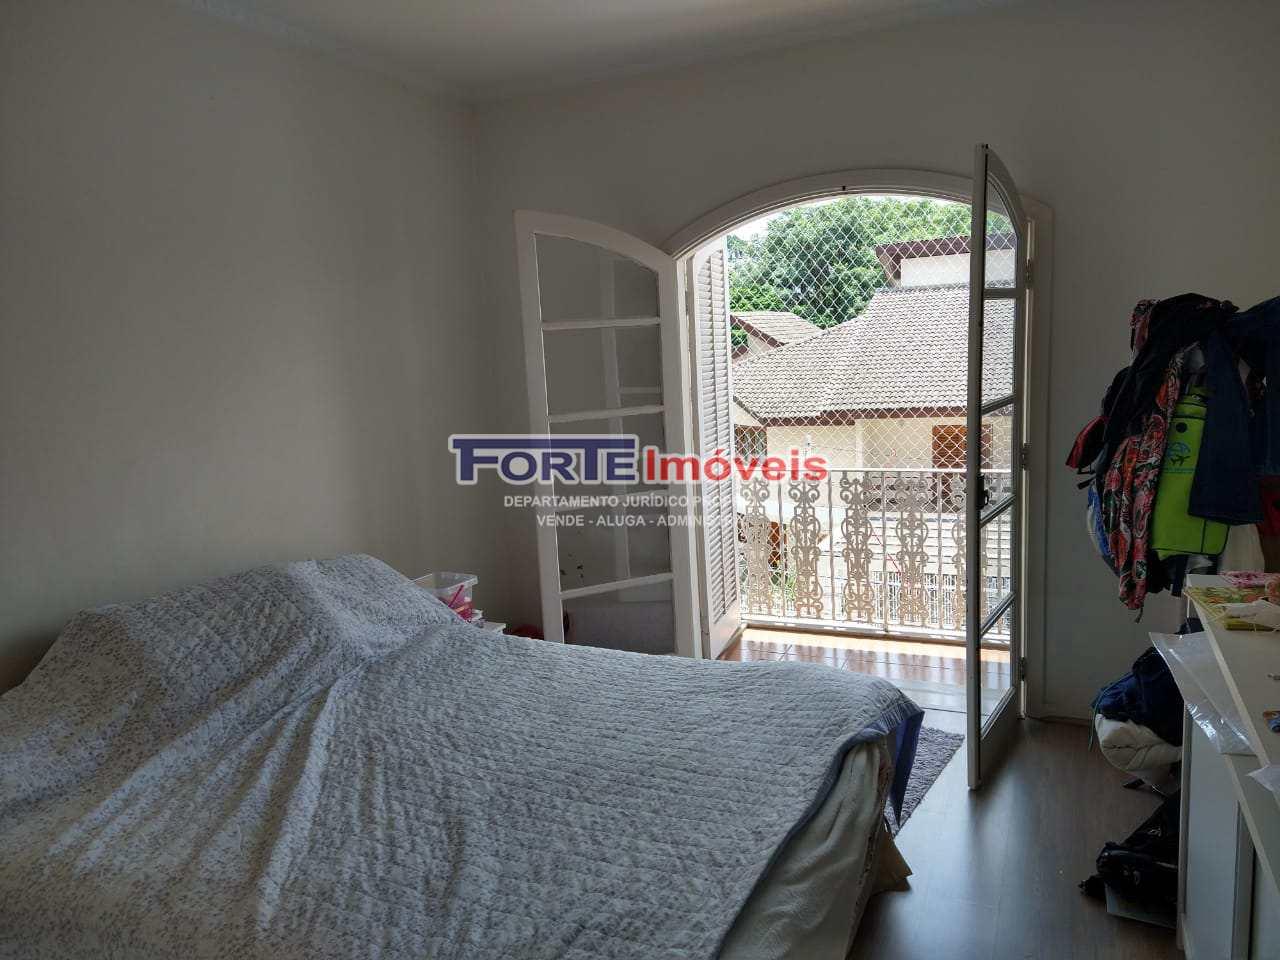 Sobrado com 3 dorms, Jardim Franca, São Paulo - R$ 790 mil, Cod: 42903719